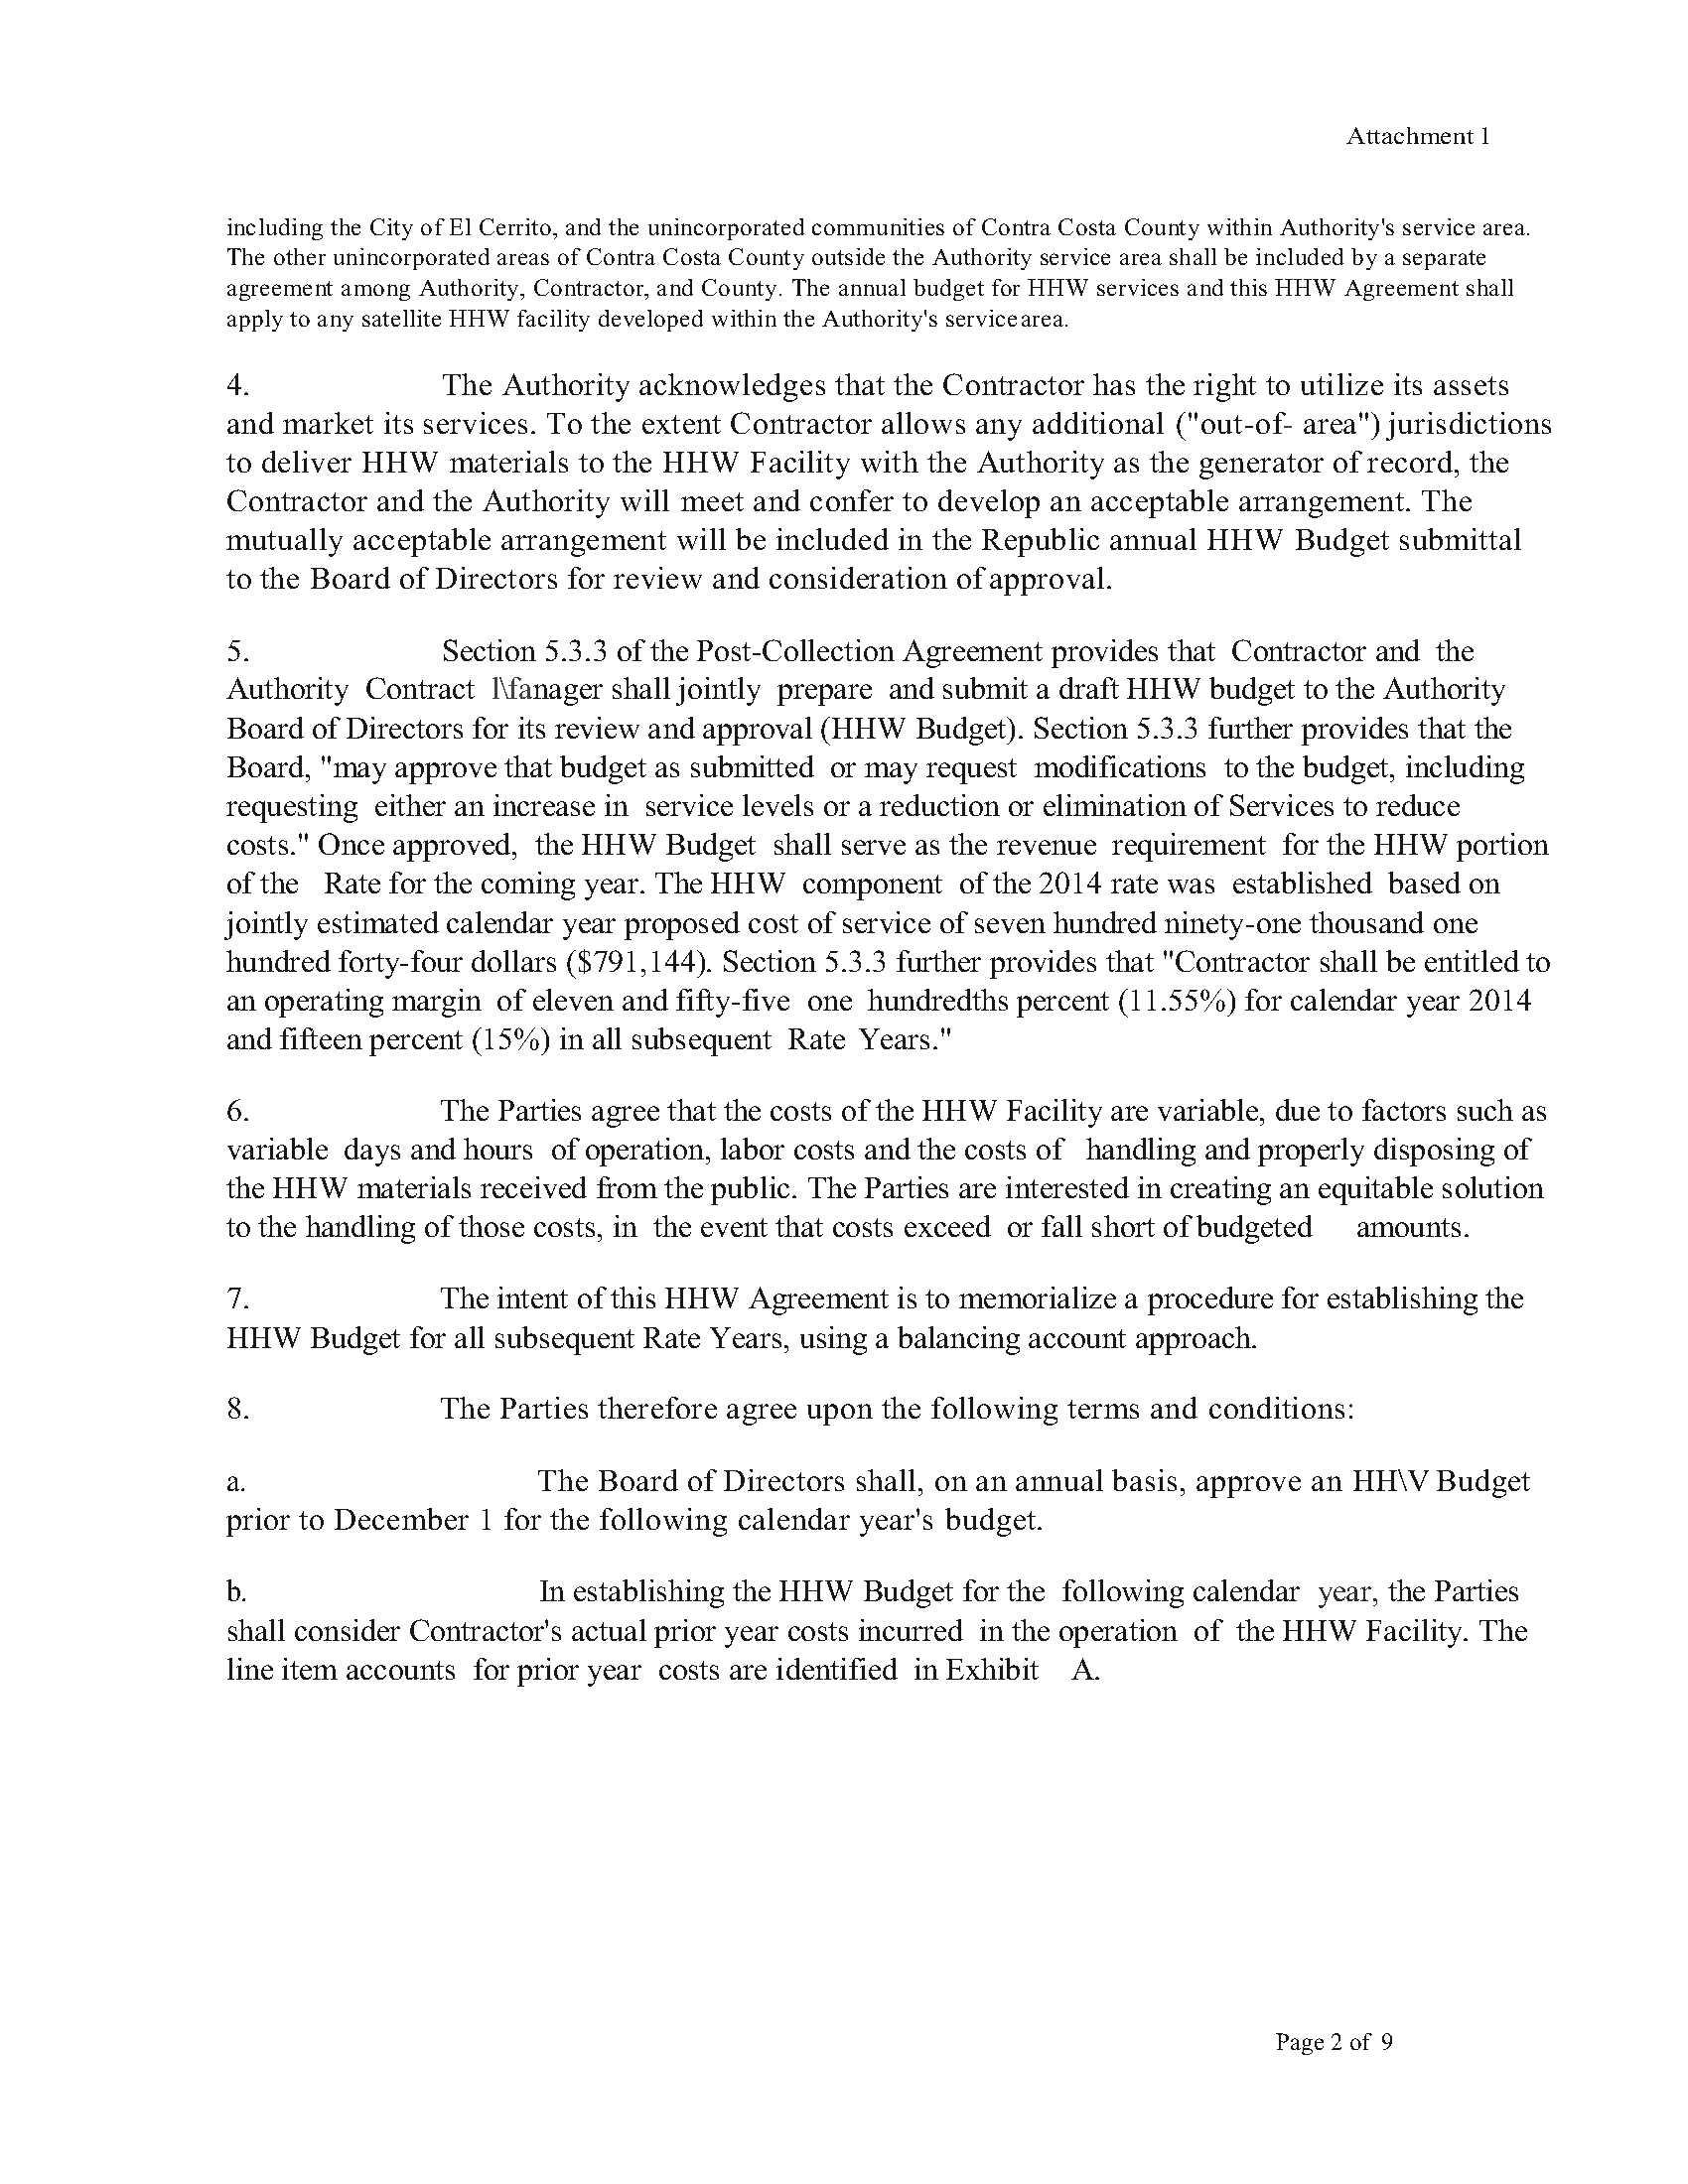 ESMAC Agenda 1.9.2019 (34 Pages)_24.jpg